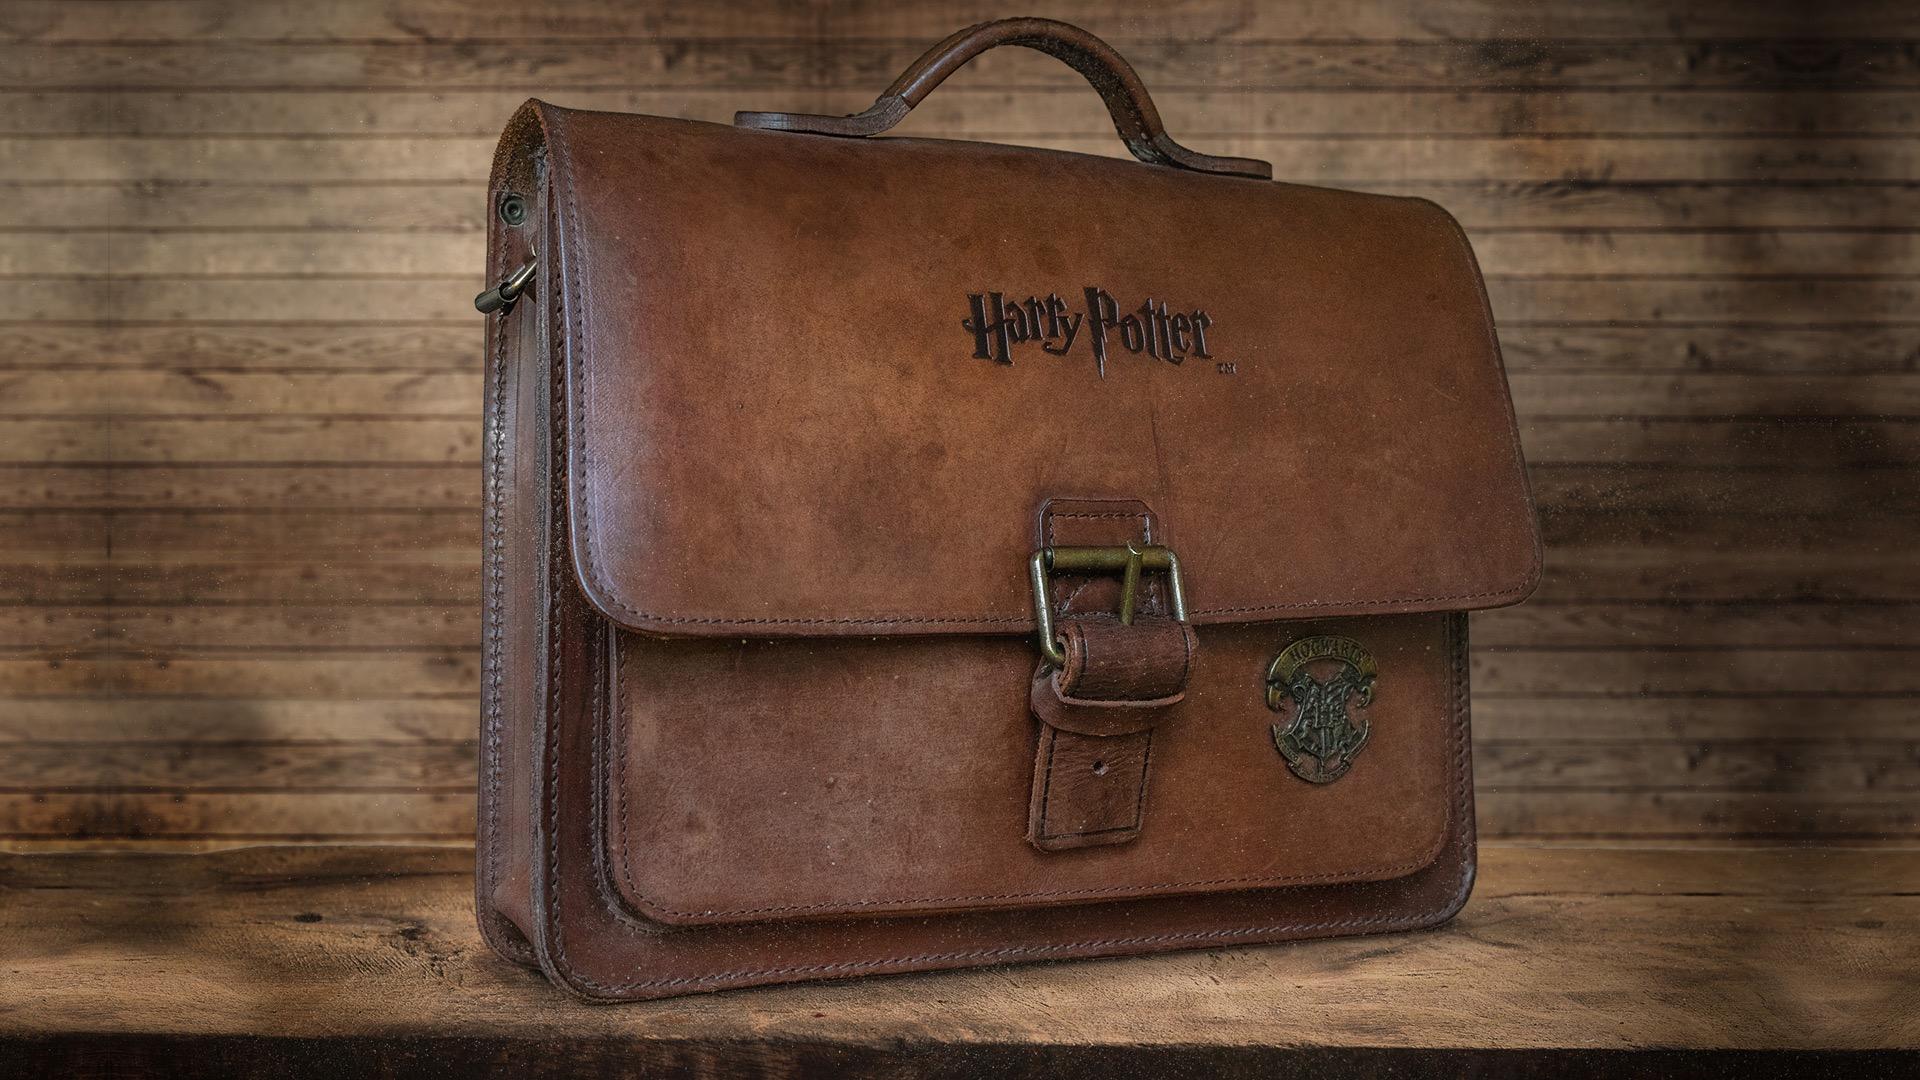 Officiel Harry Potter small satchel made by Ruitertassen.